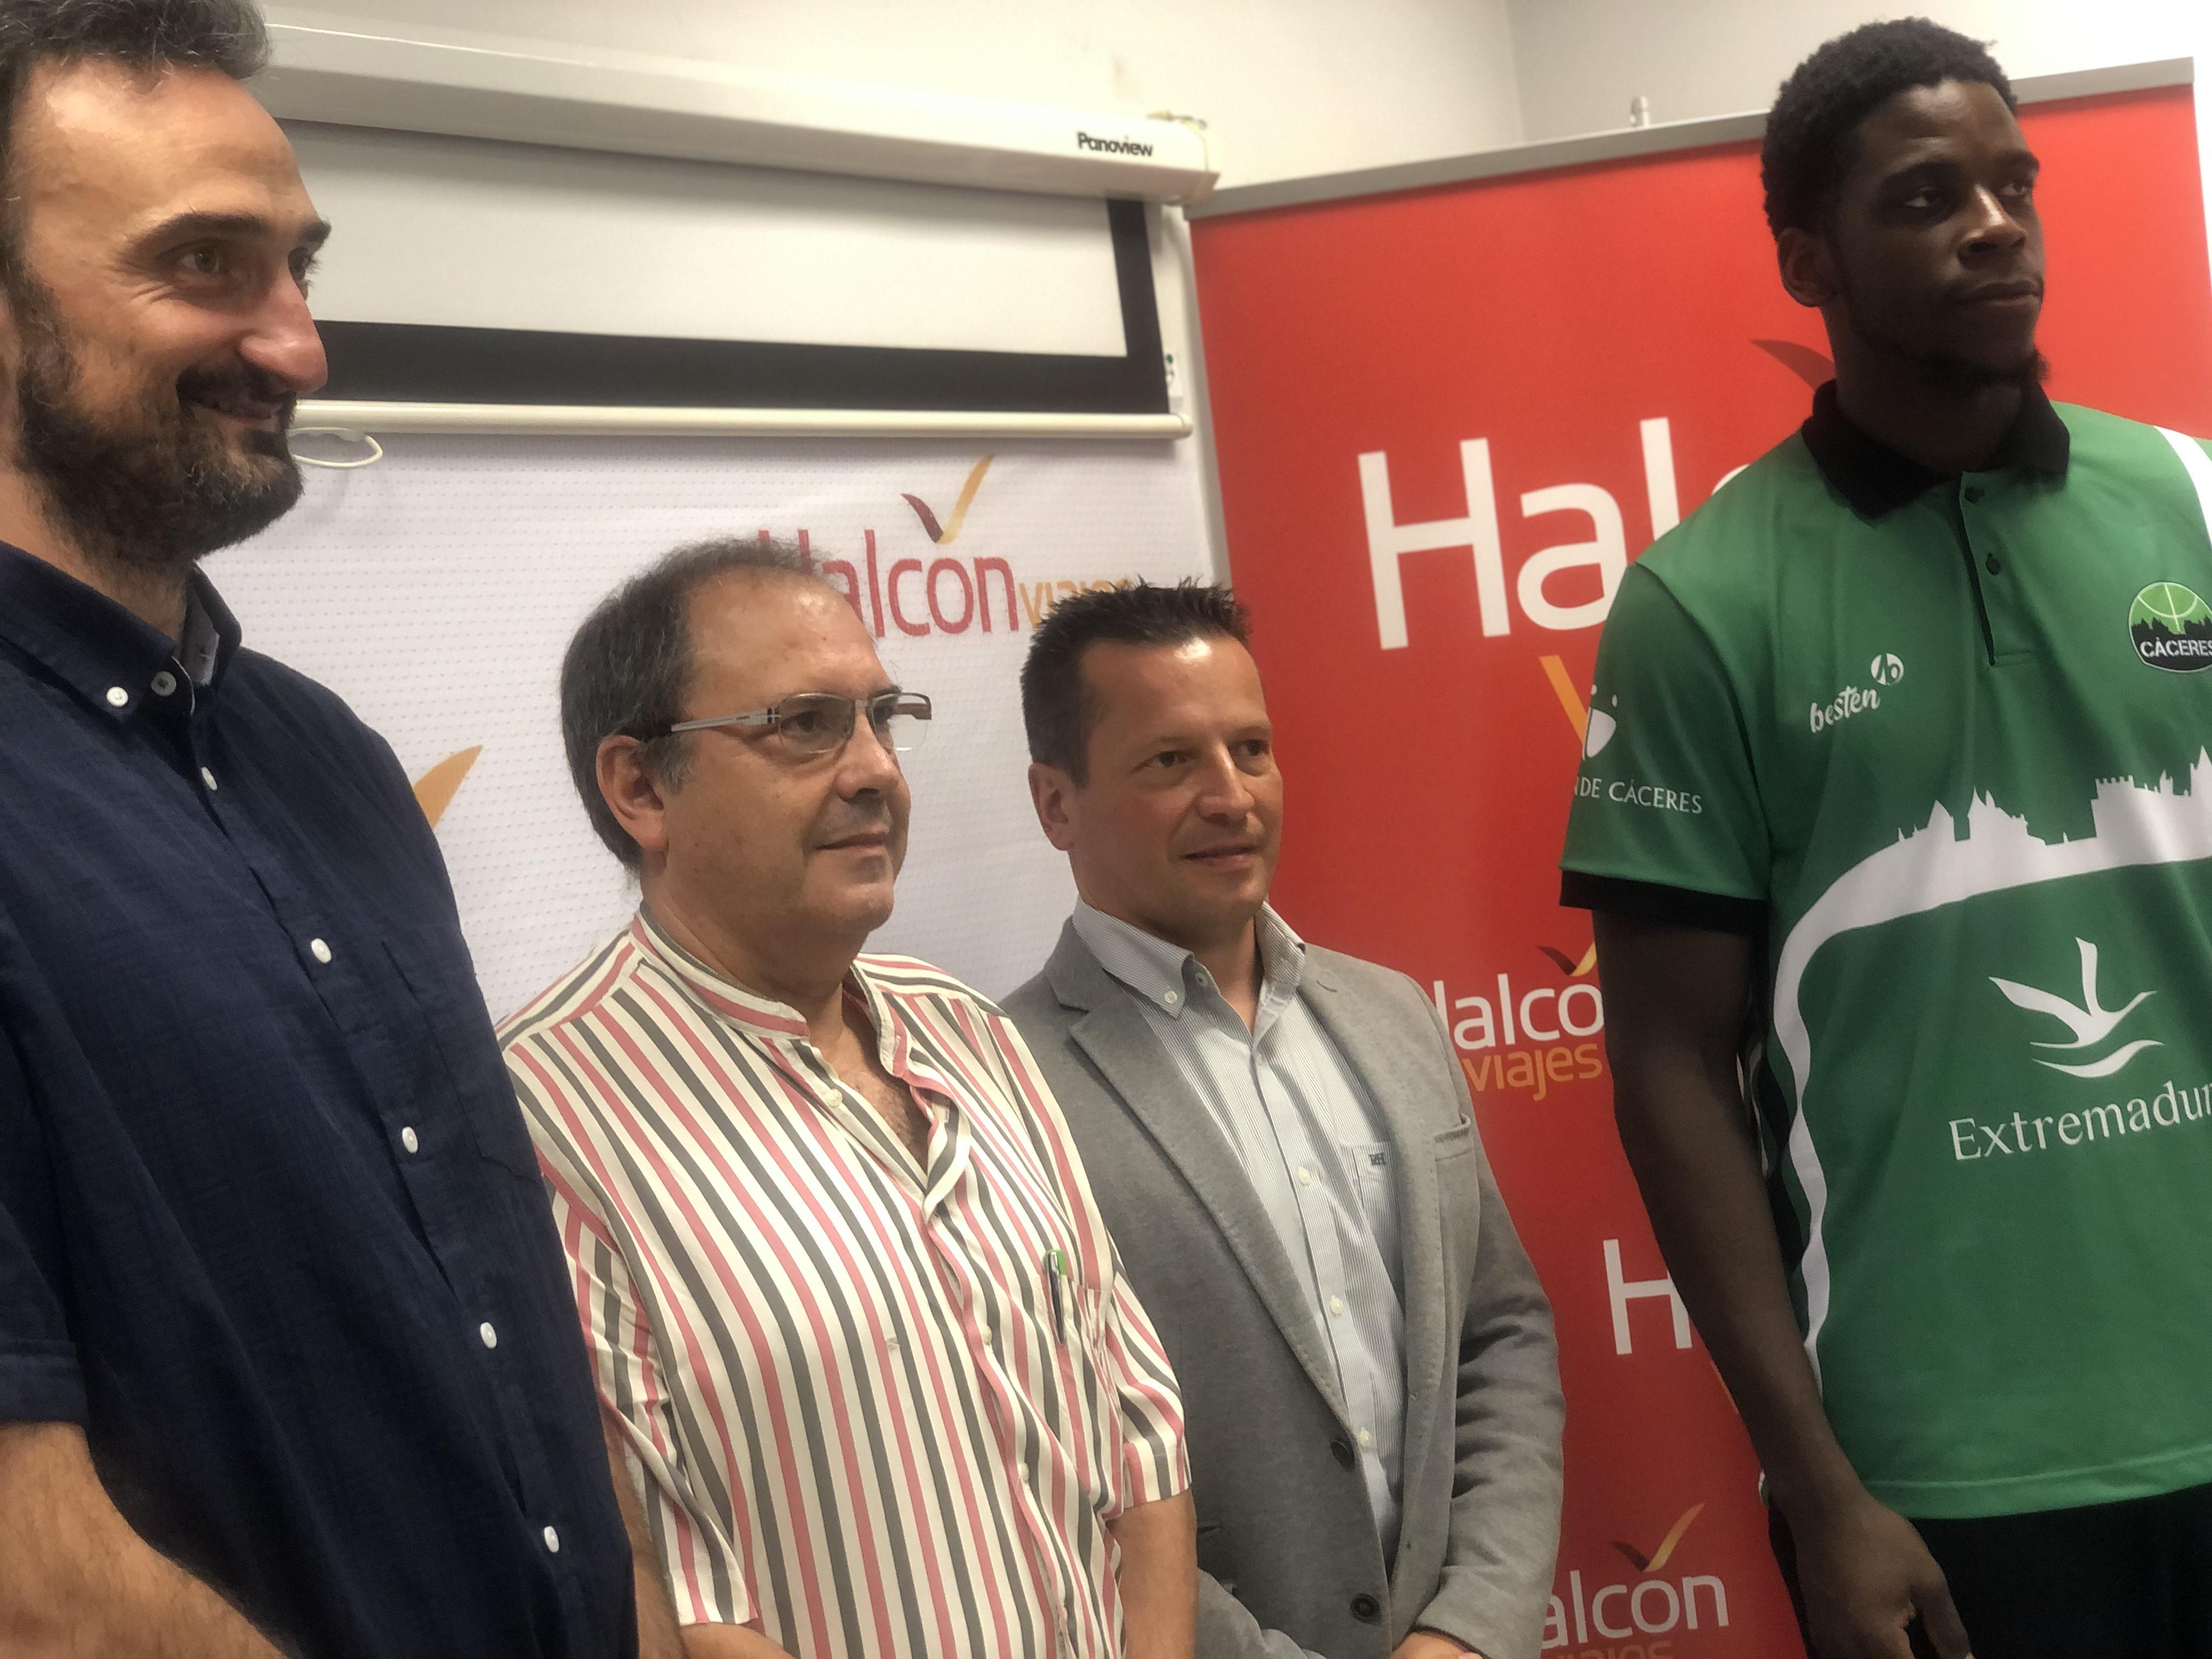 Arkeem Joseph llega al Cáceres de la mano de Halcón Viajes